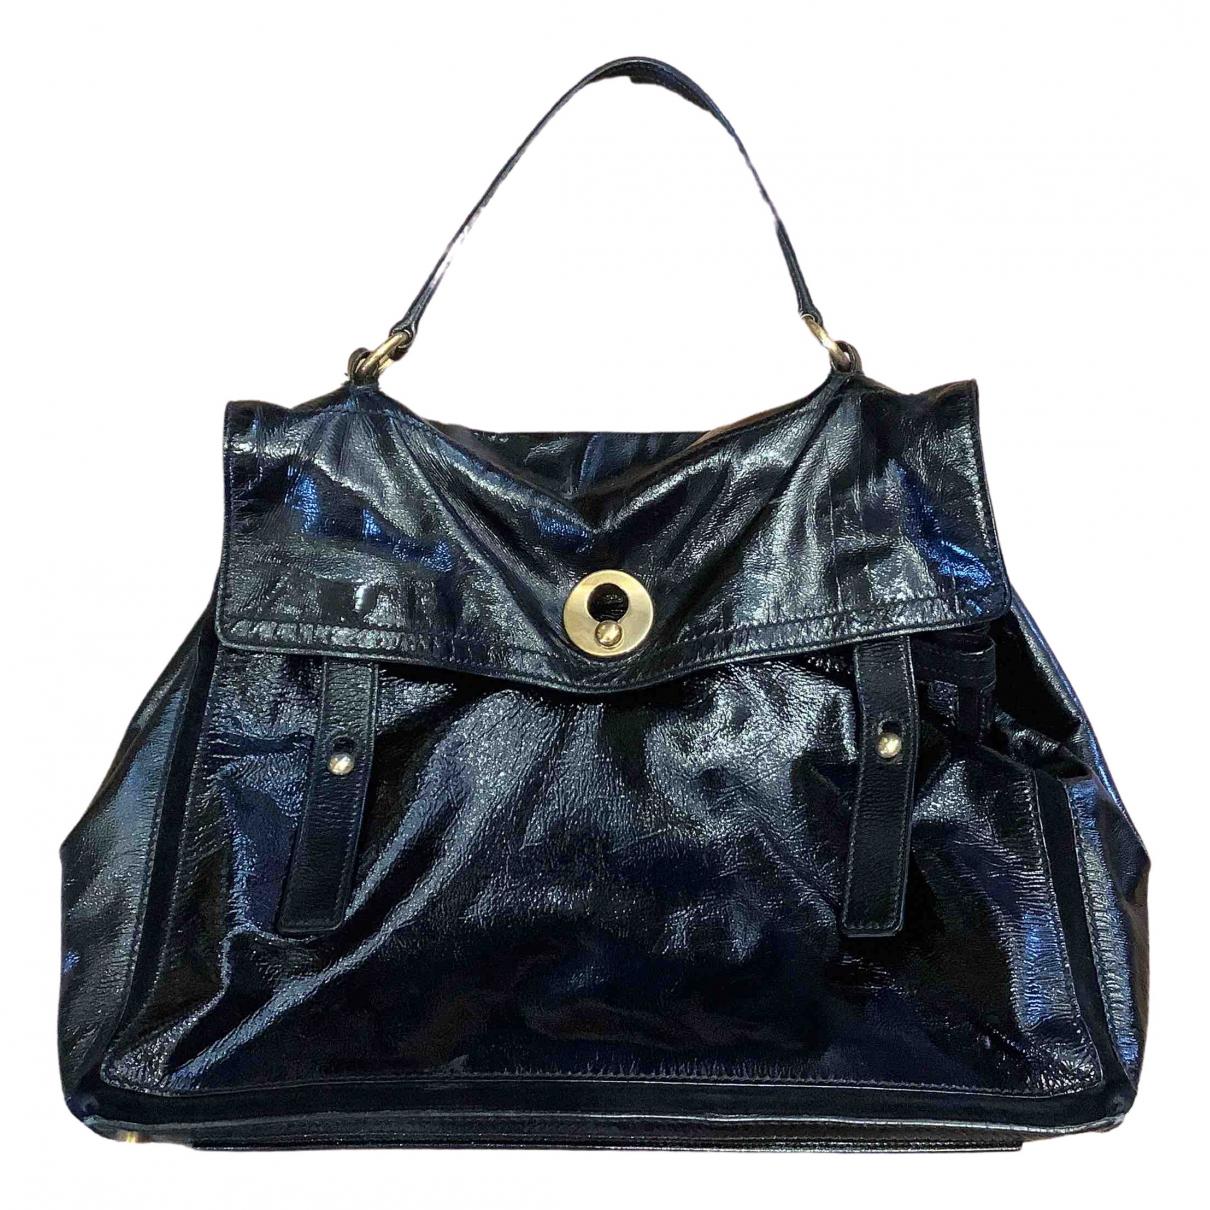 Yves Saint Laurent Muse Two Black Patent leather handbag for Women \N